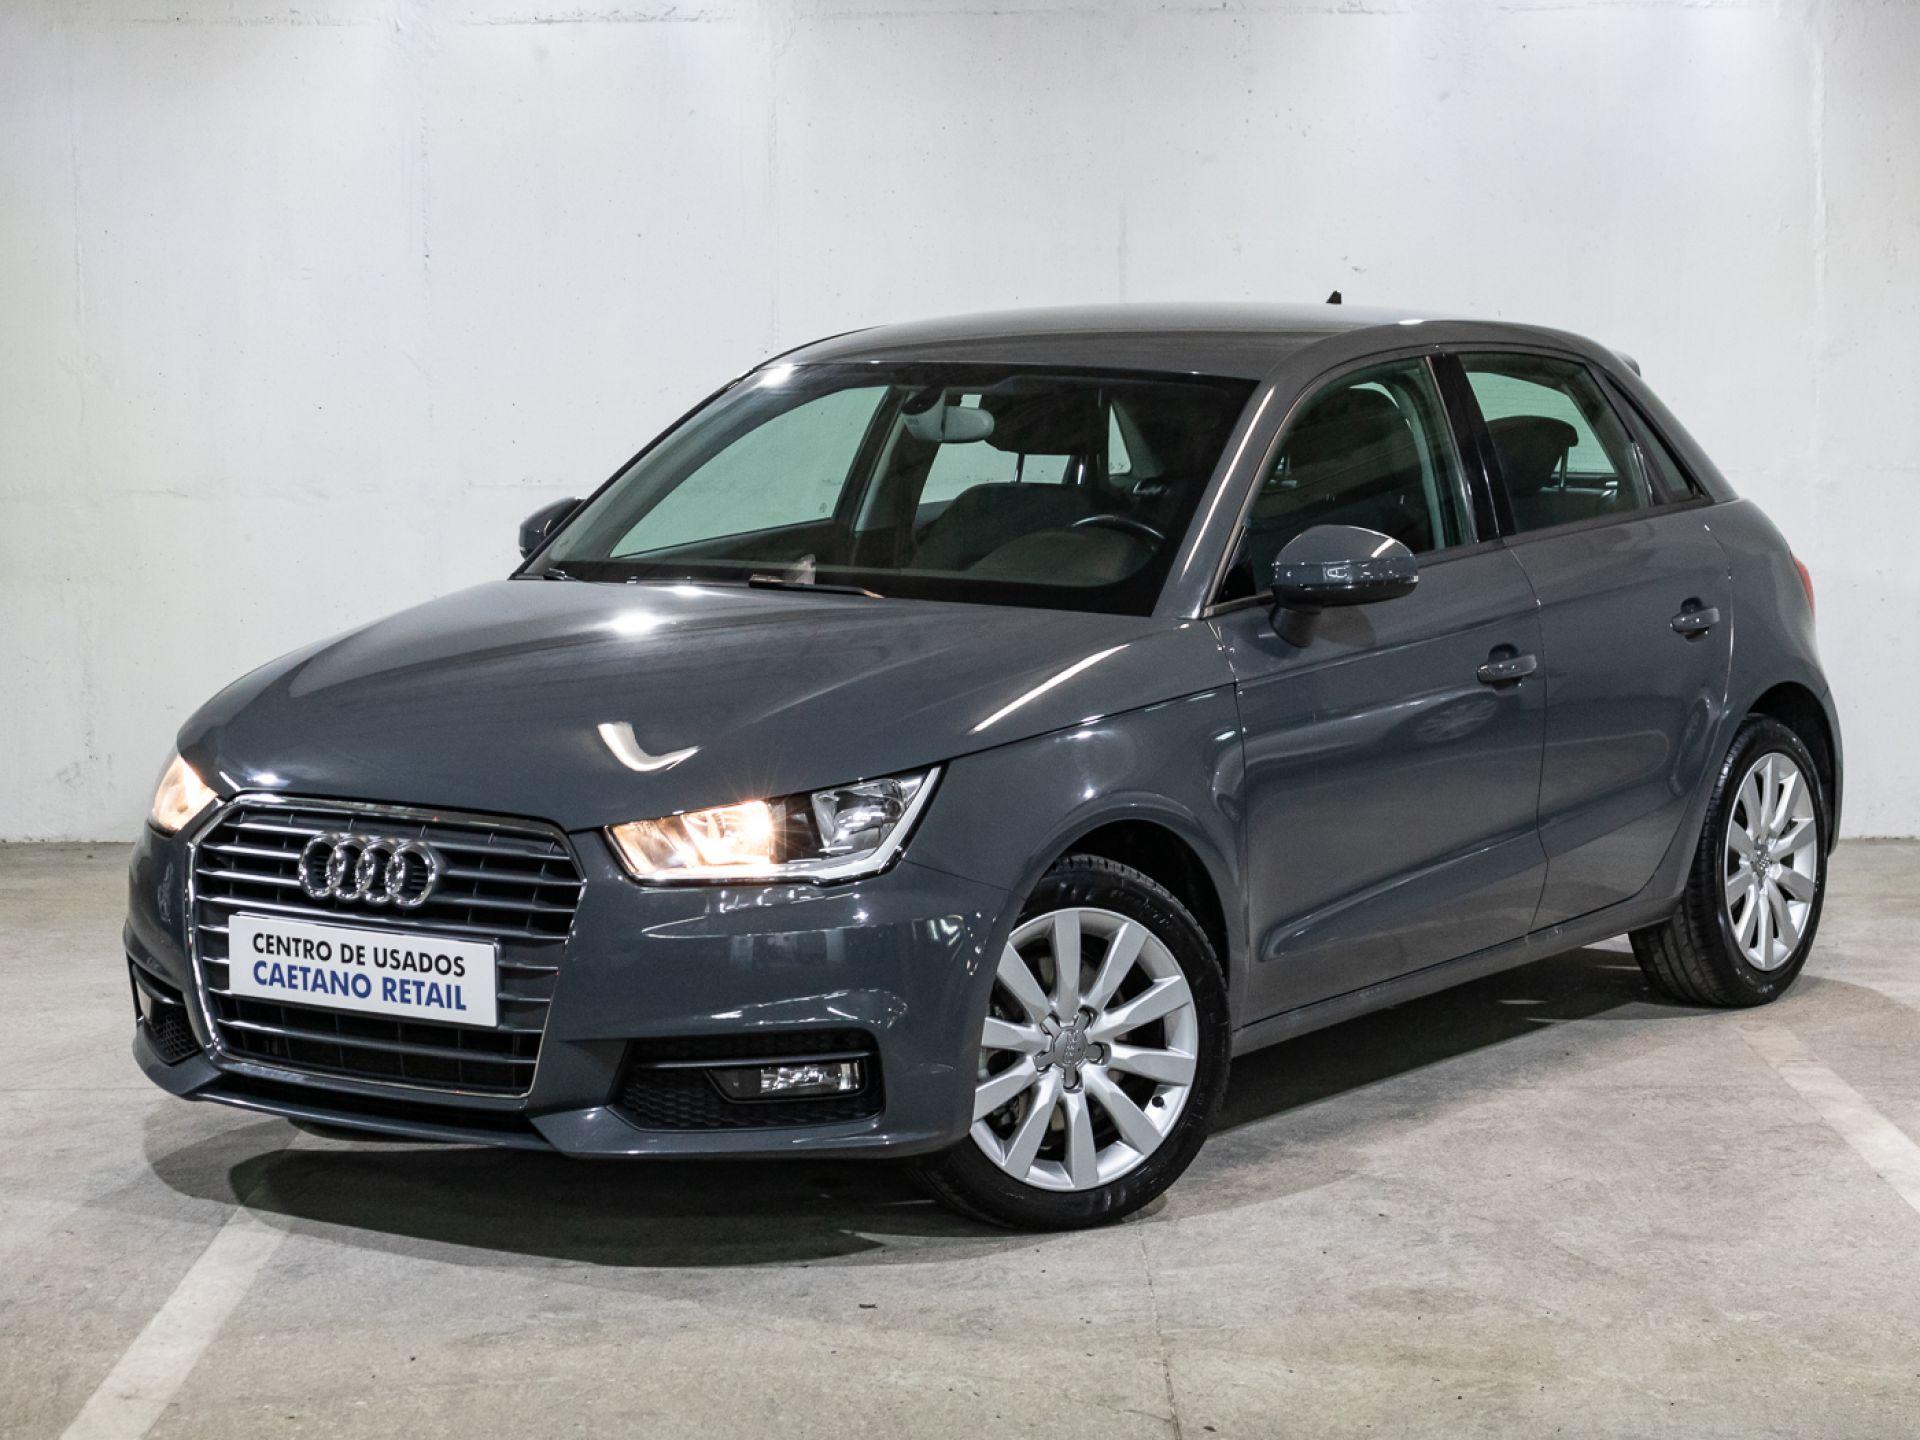 Audi A1 1.6 TDI 116cv Sportback segunda mão Lisboa